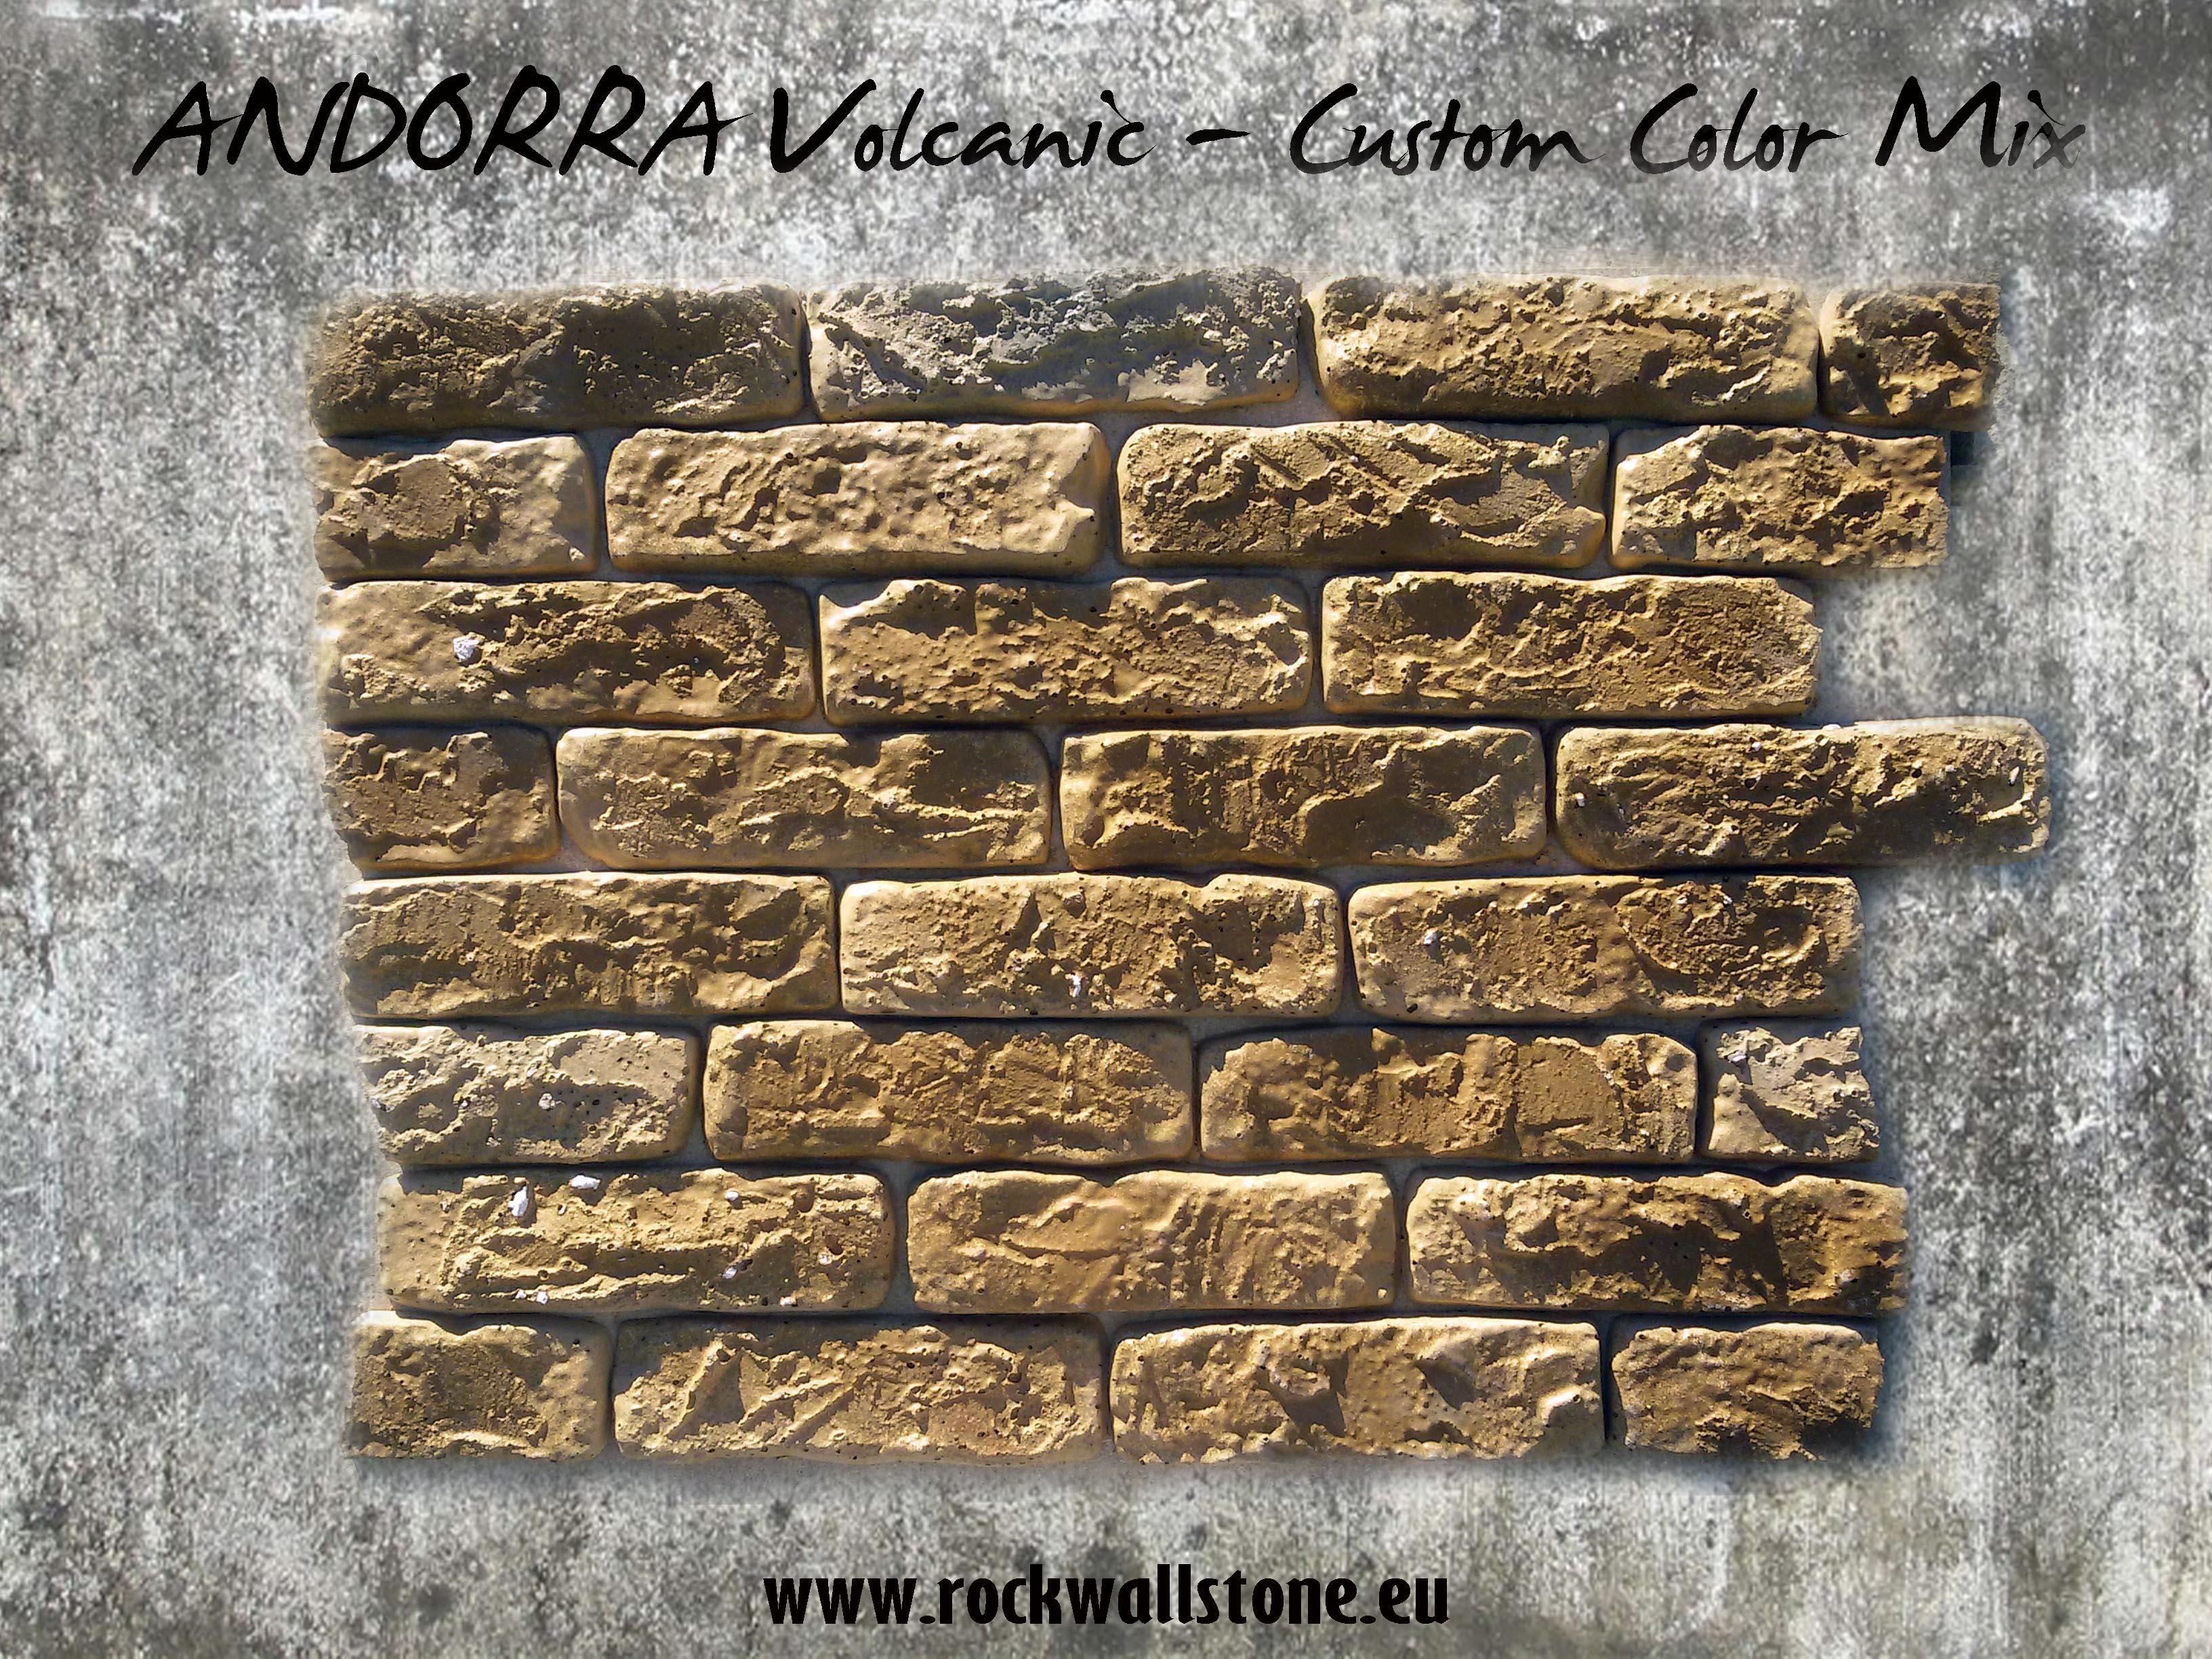 andorra-volc-custom-5